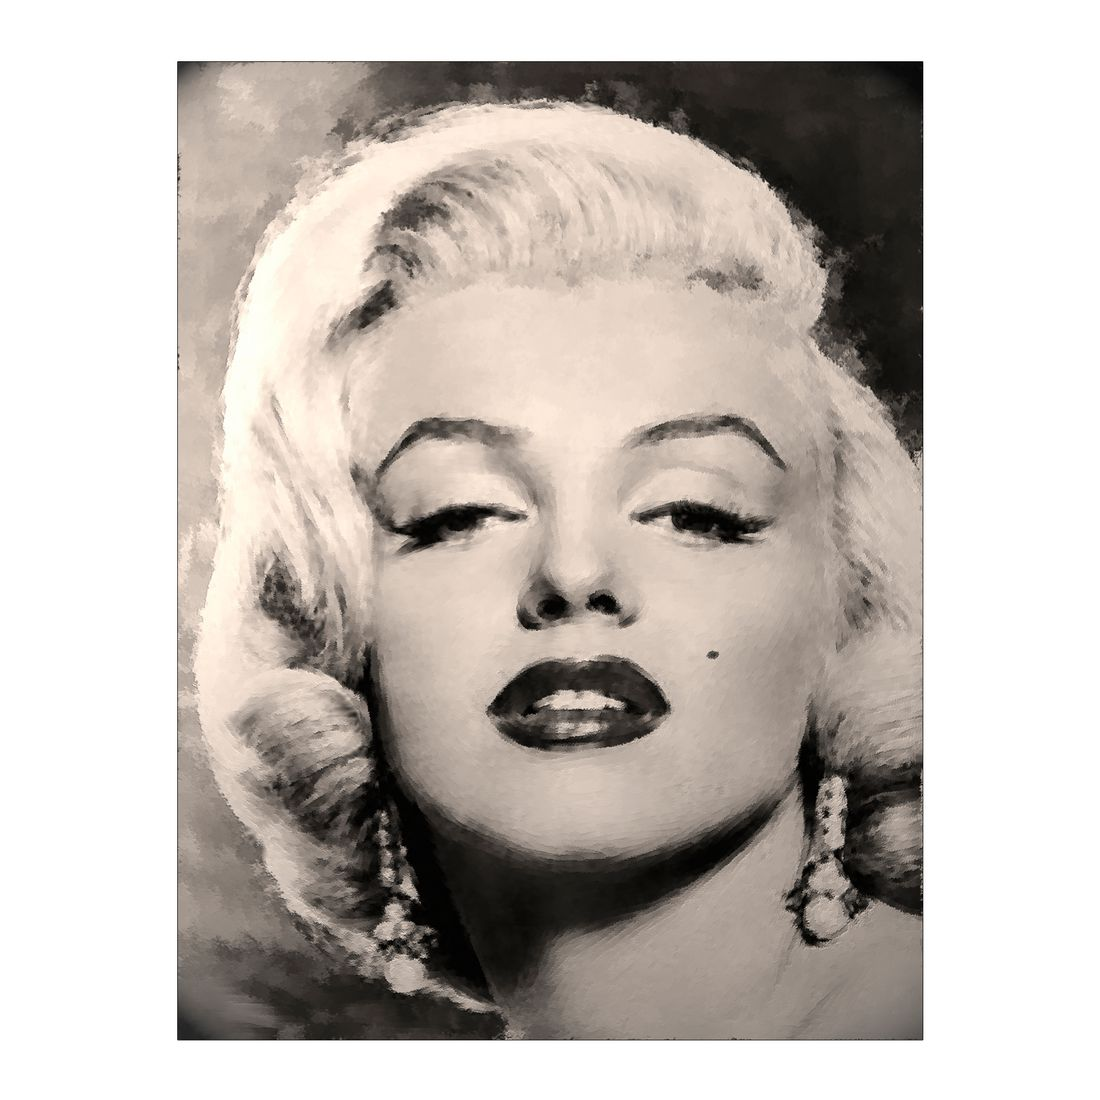 Leinwandbild Marilyn Monroe – 100×75 cm, Gallery of Innovative Art günstig